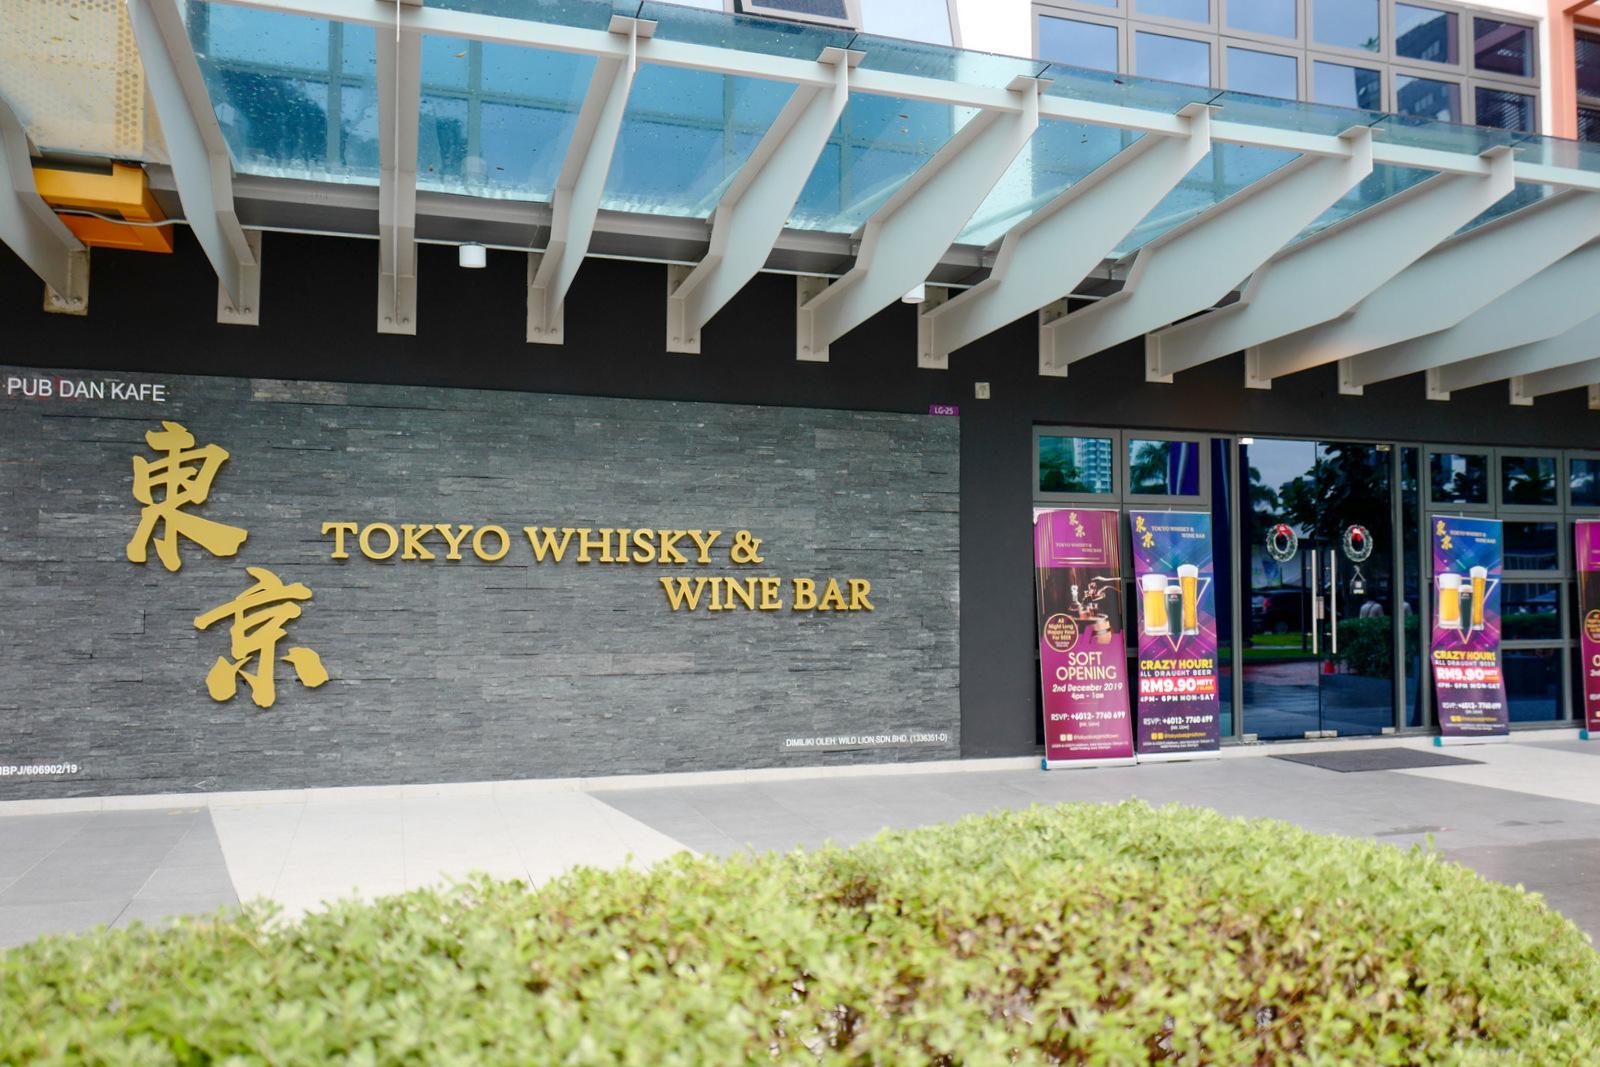 tokyo whisky & wine bar, pj midtown